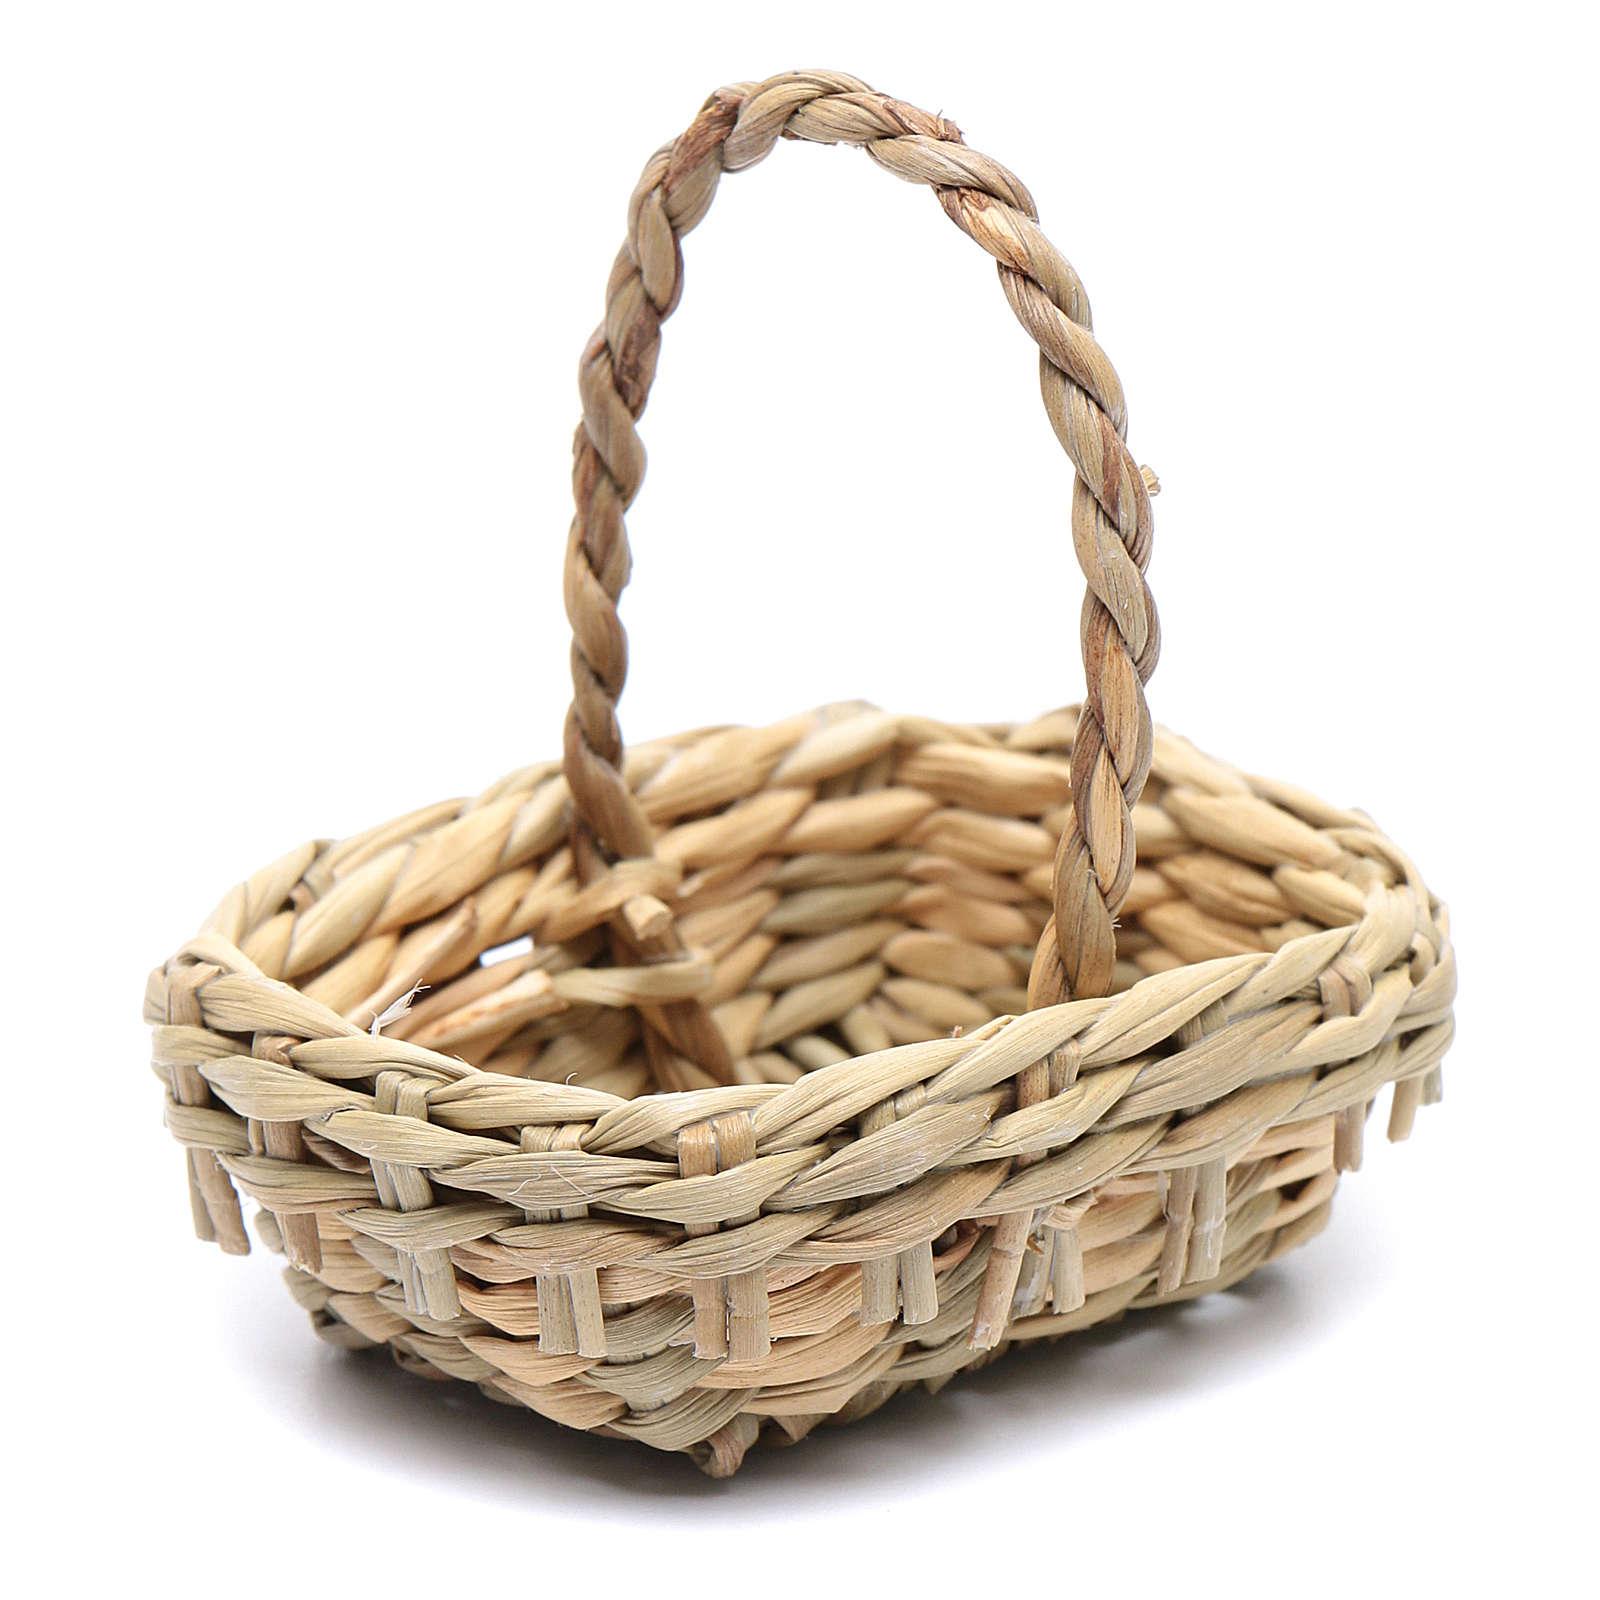 DIY nativity scene wicker basket 4,5x6 cm 4